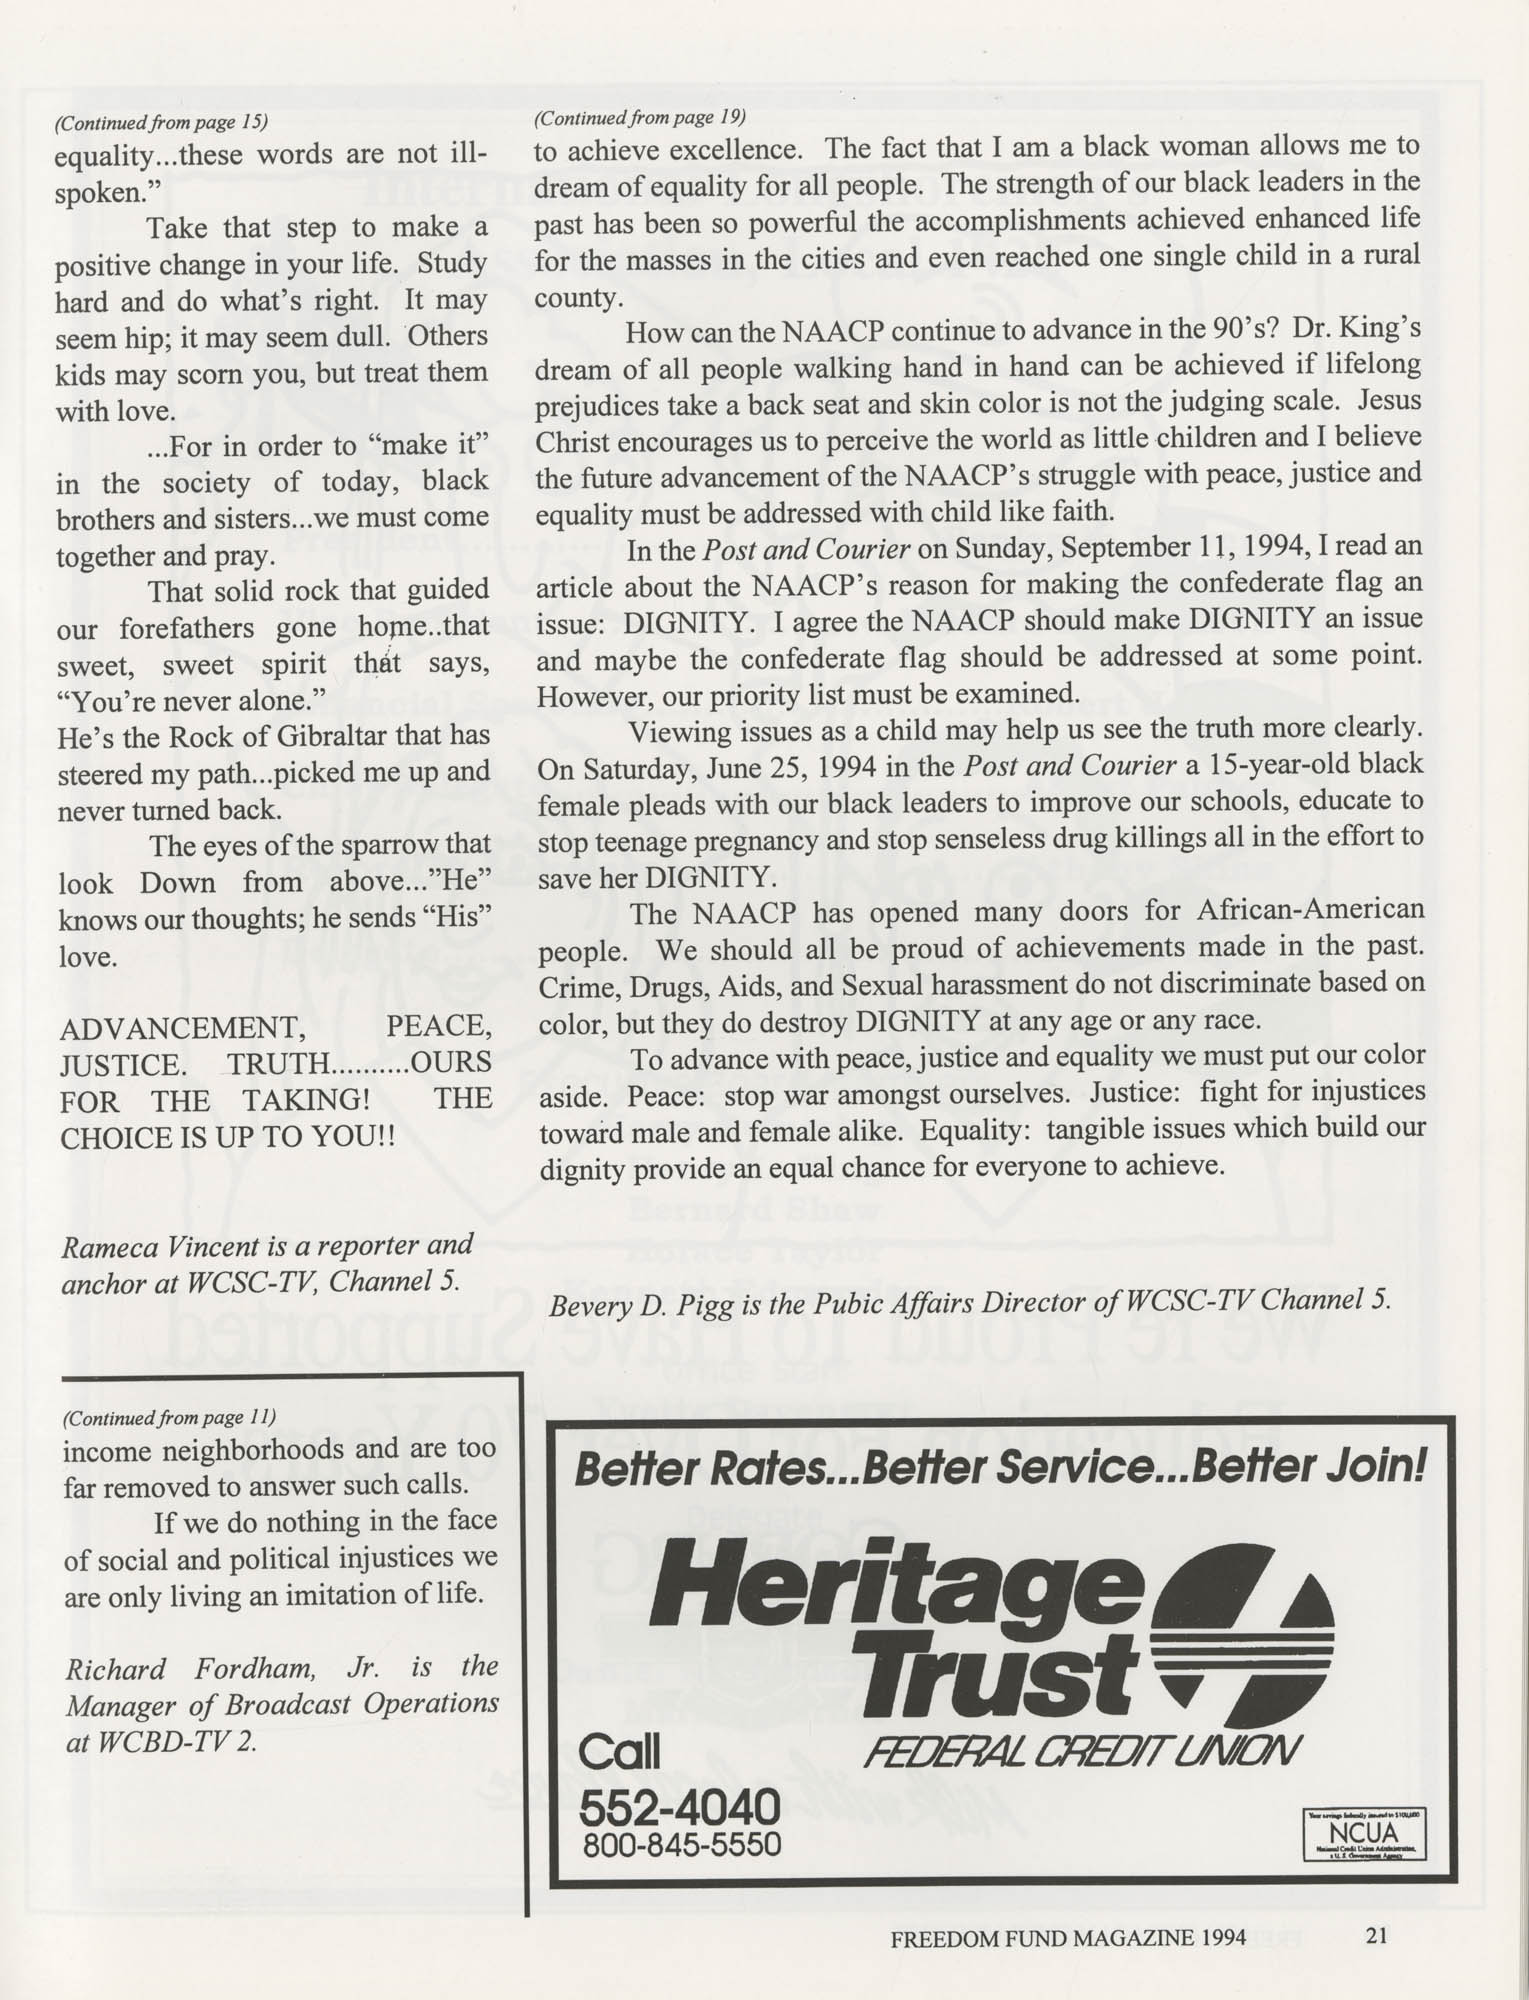 Freedom Fund Magazine, 1994, Page 21